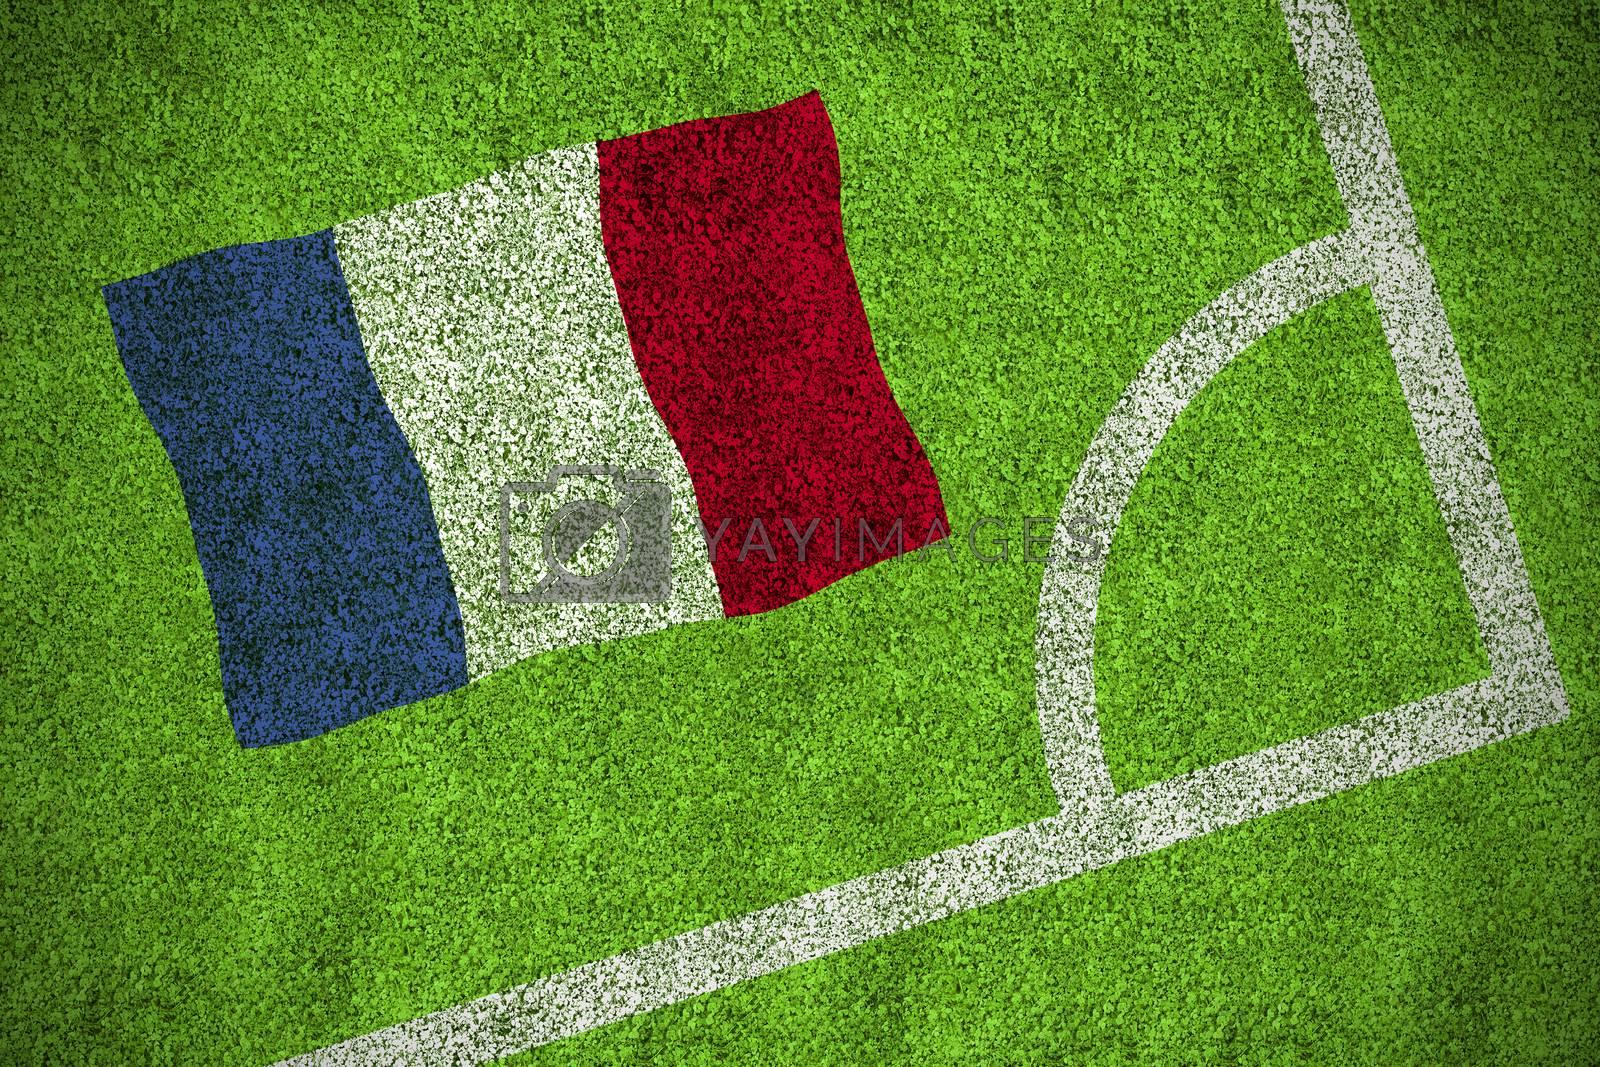 France national flag by Wavebreakmedia